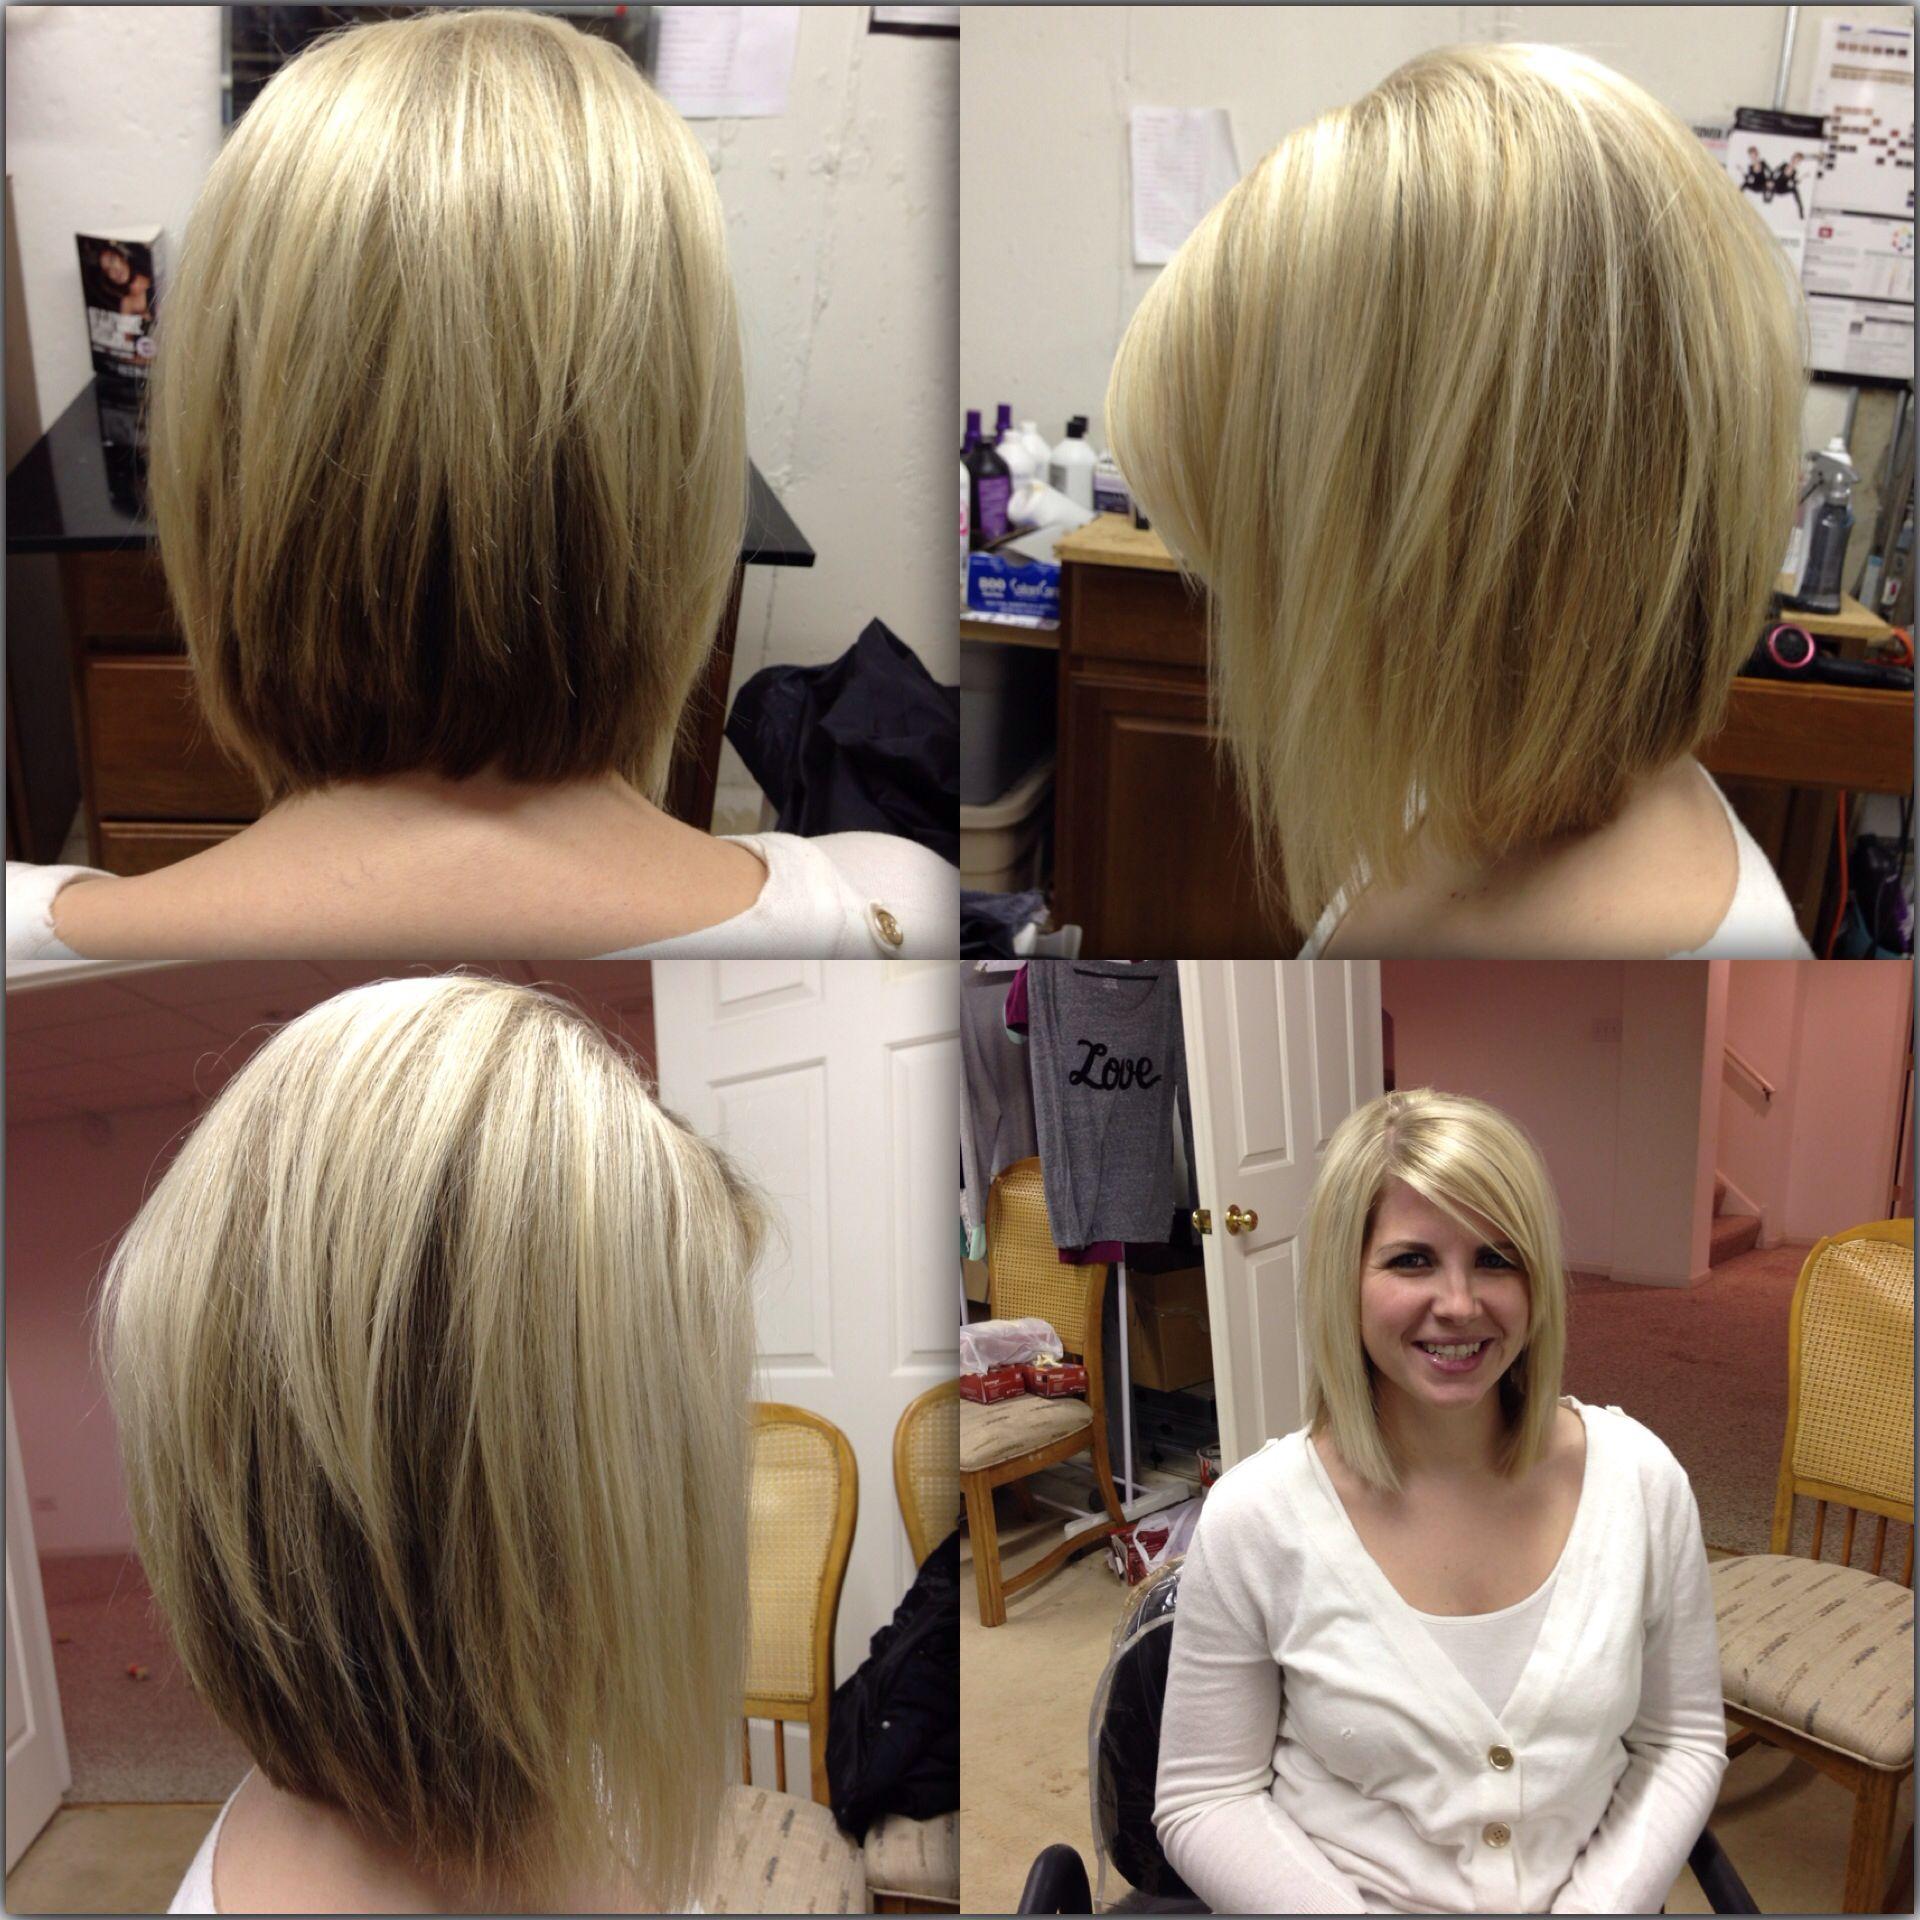 angled bobs with bangs | razor cut bob, bobs and blondes